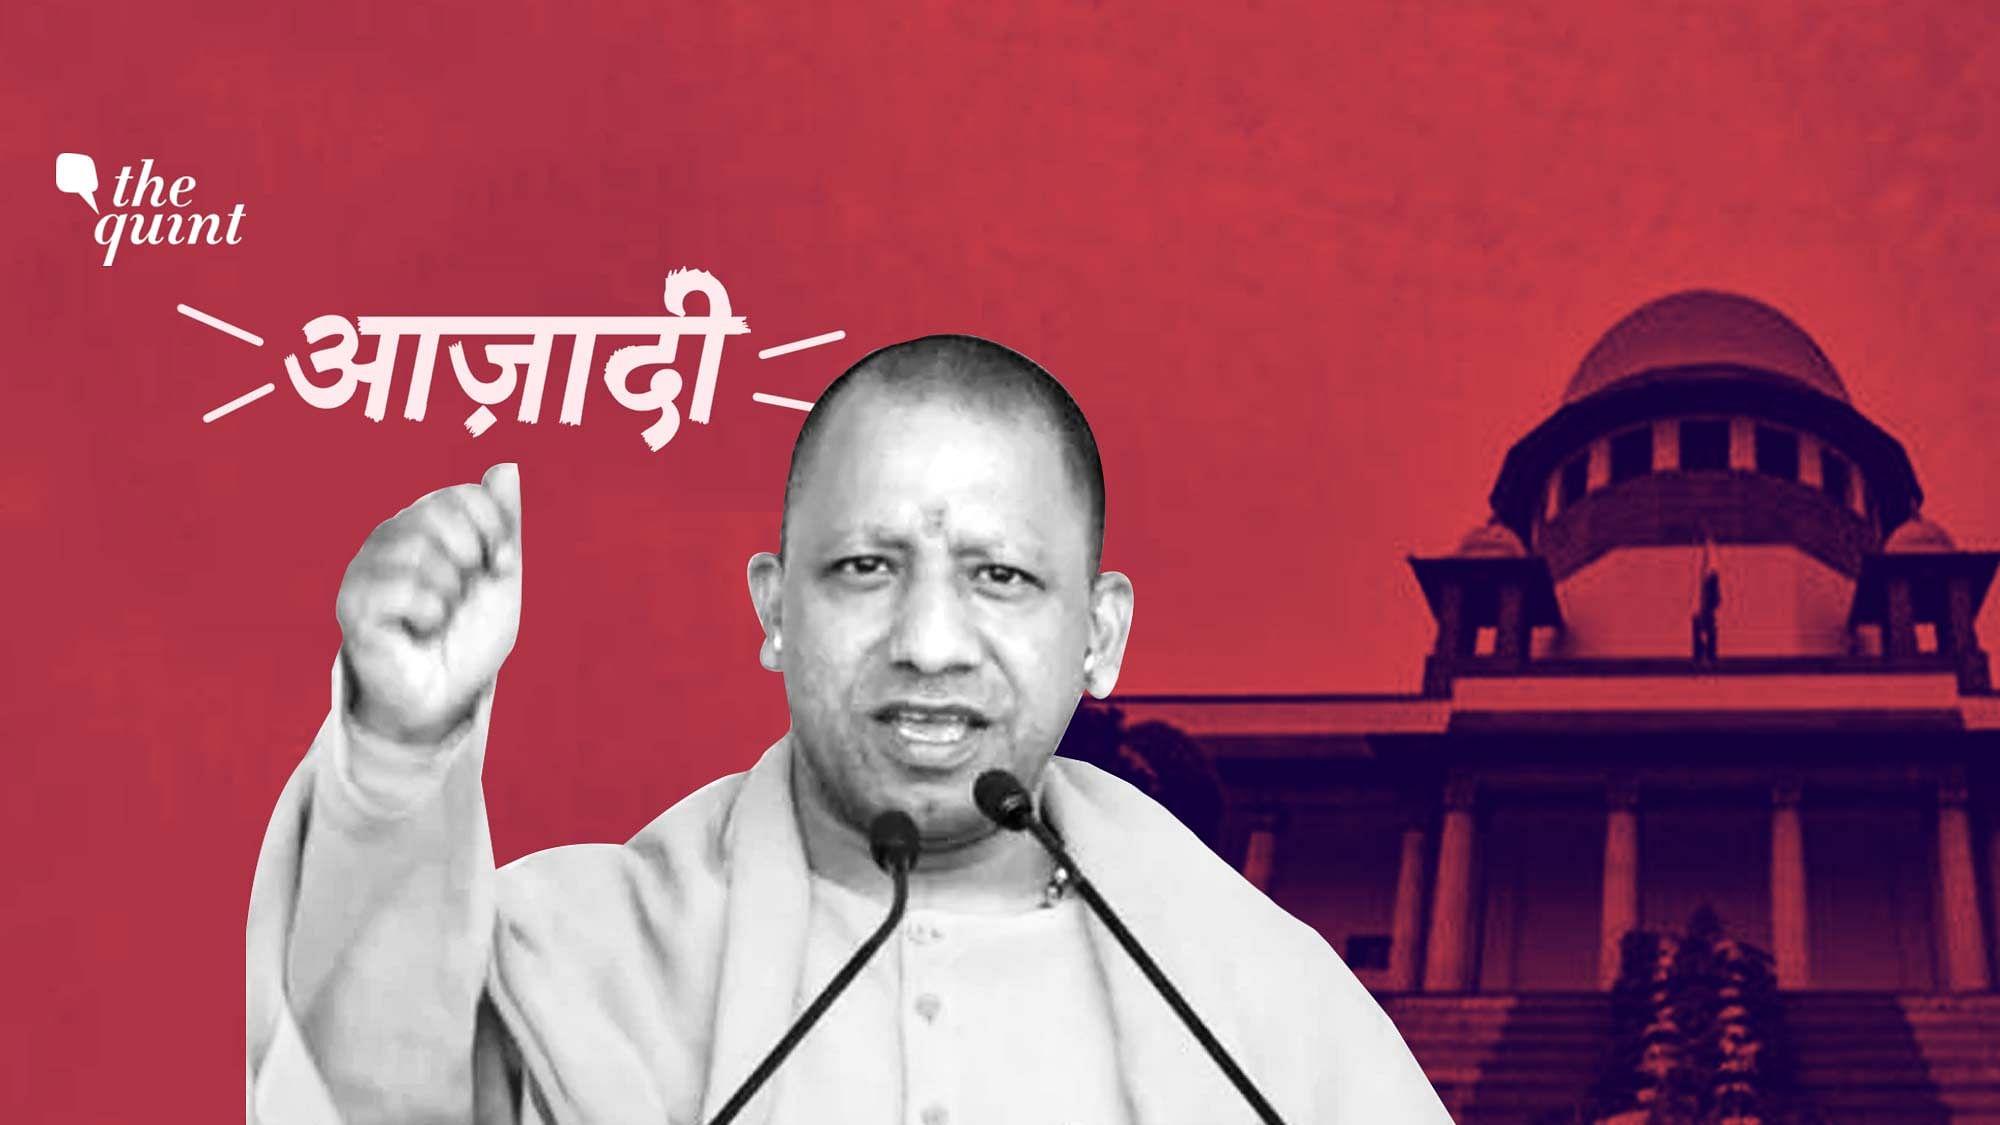 Despite Adityanath Claim, Chanting 'Azadi' Slogans Isn't Sedition